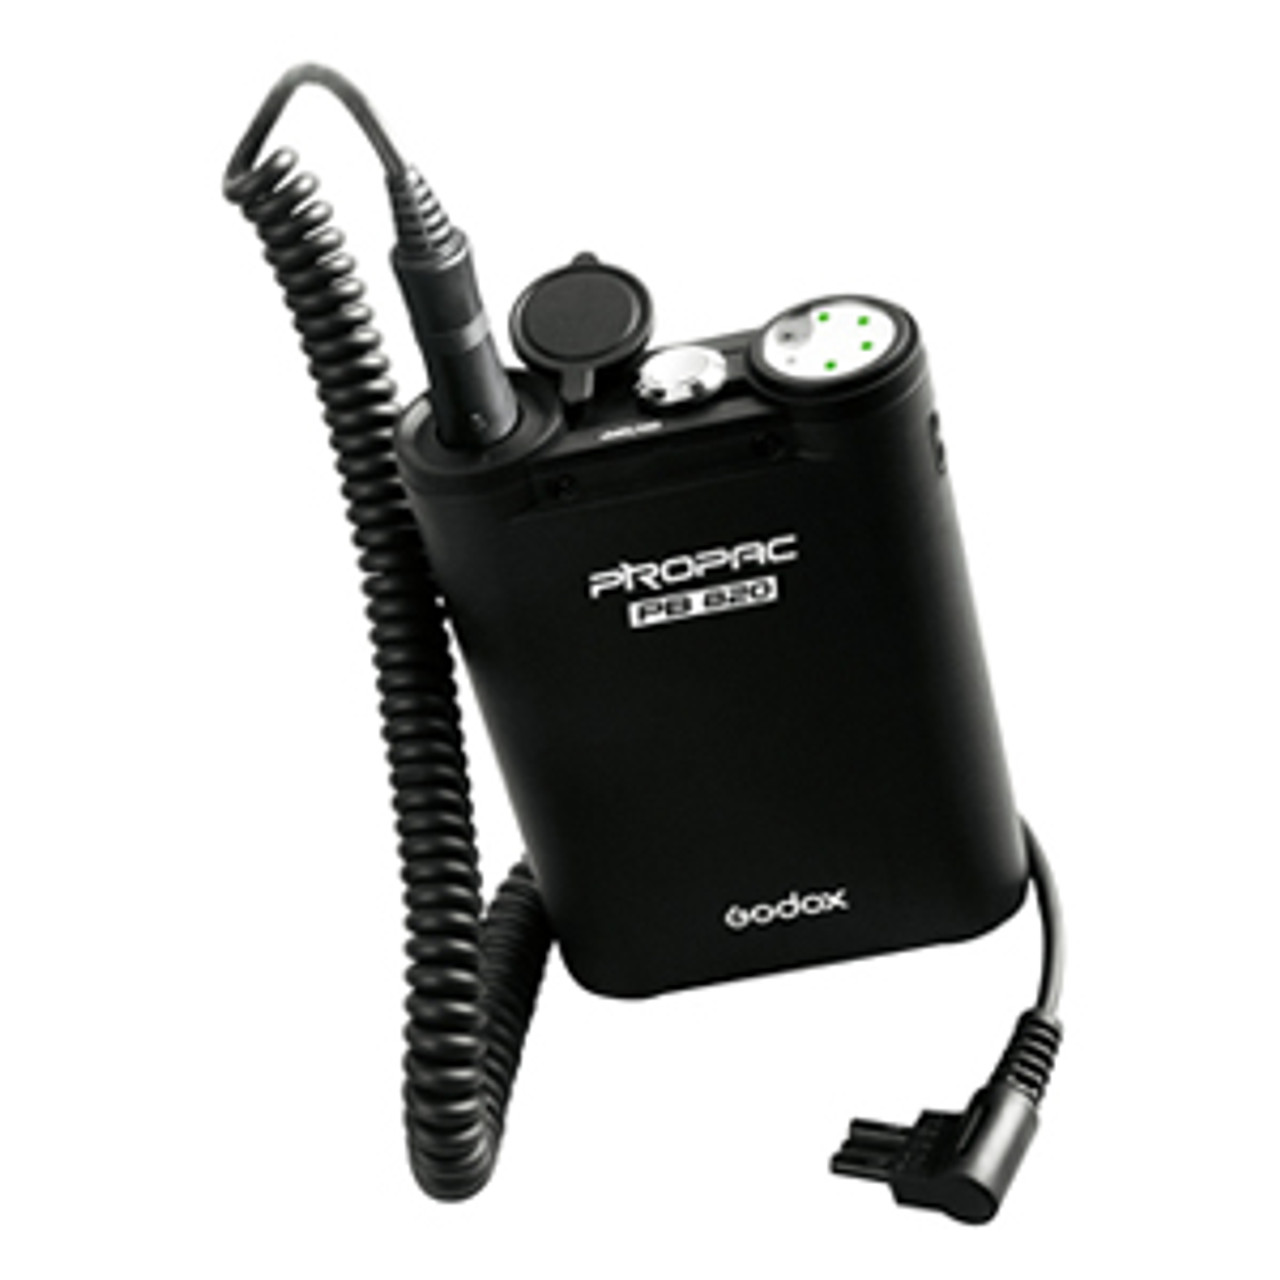 Godox Power Source for Speedlite PB820